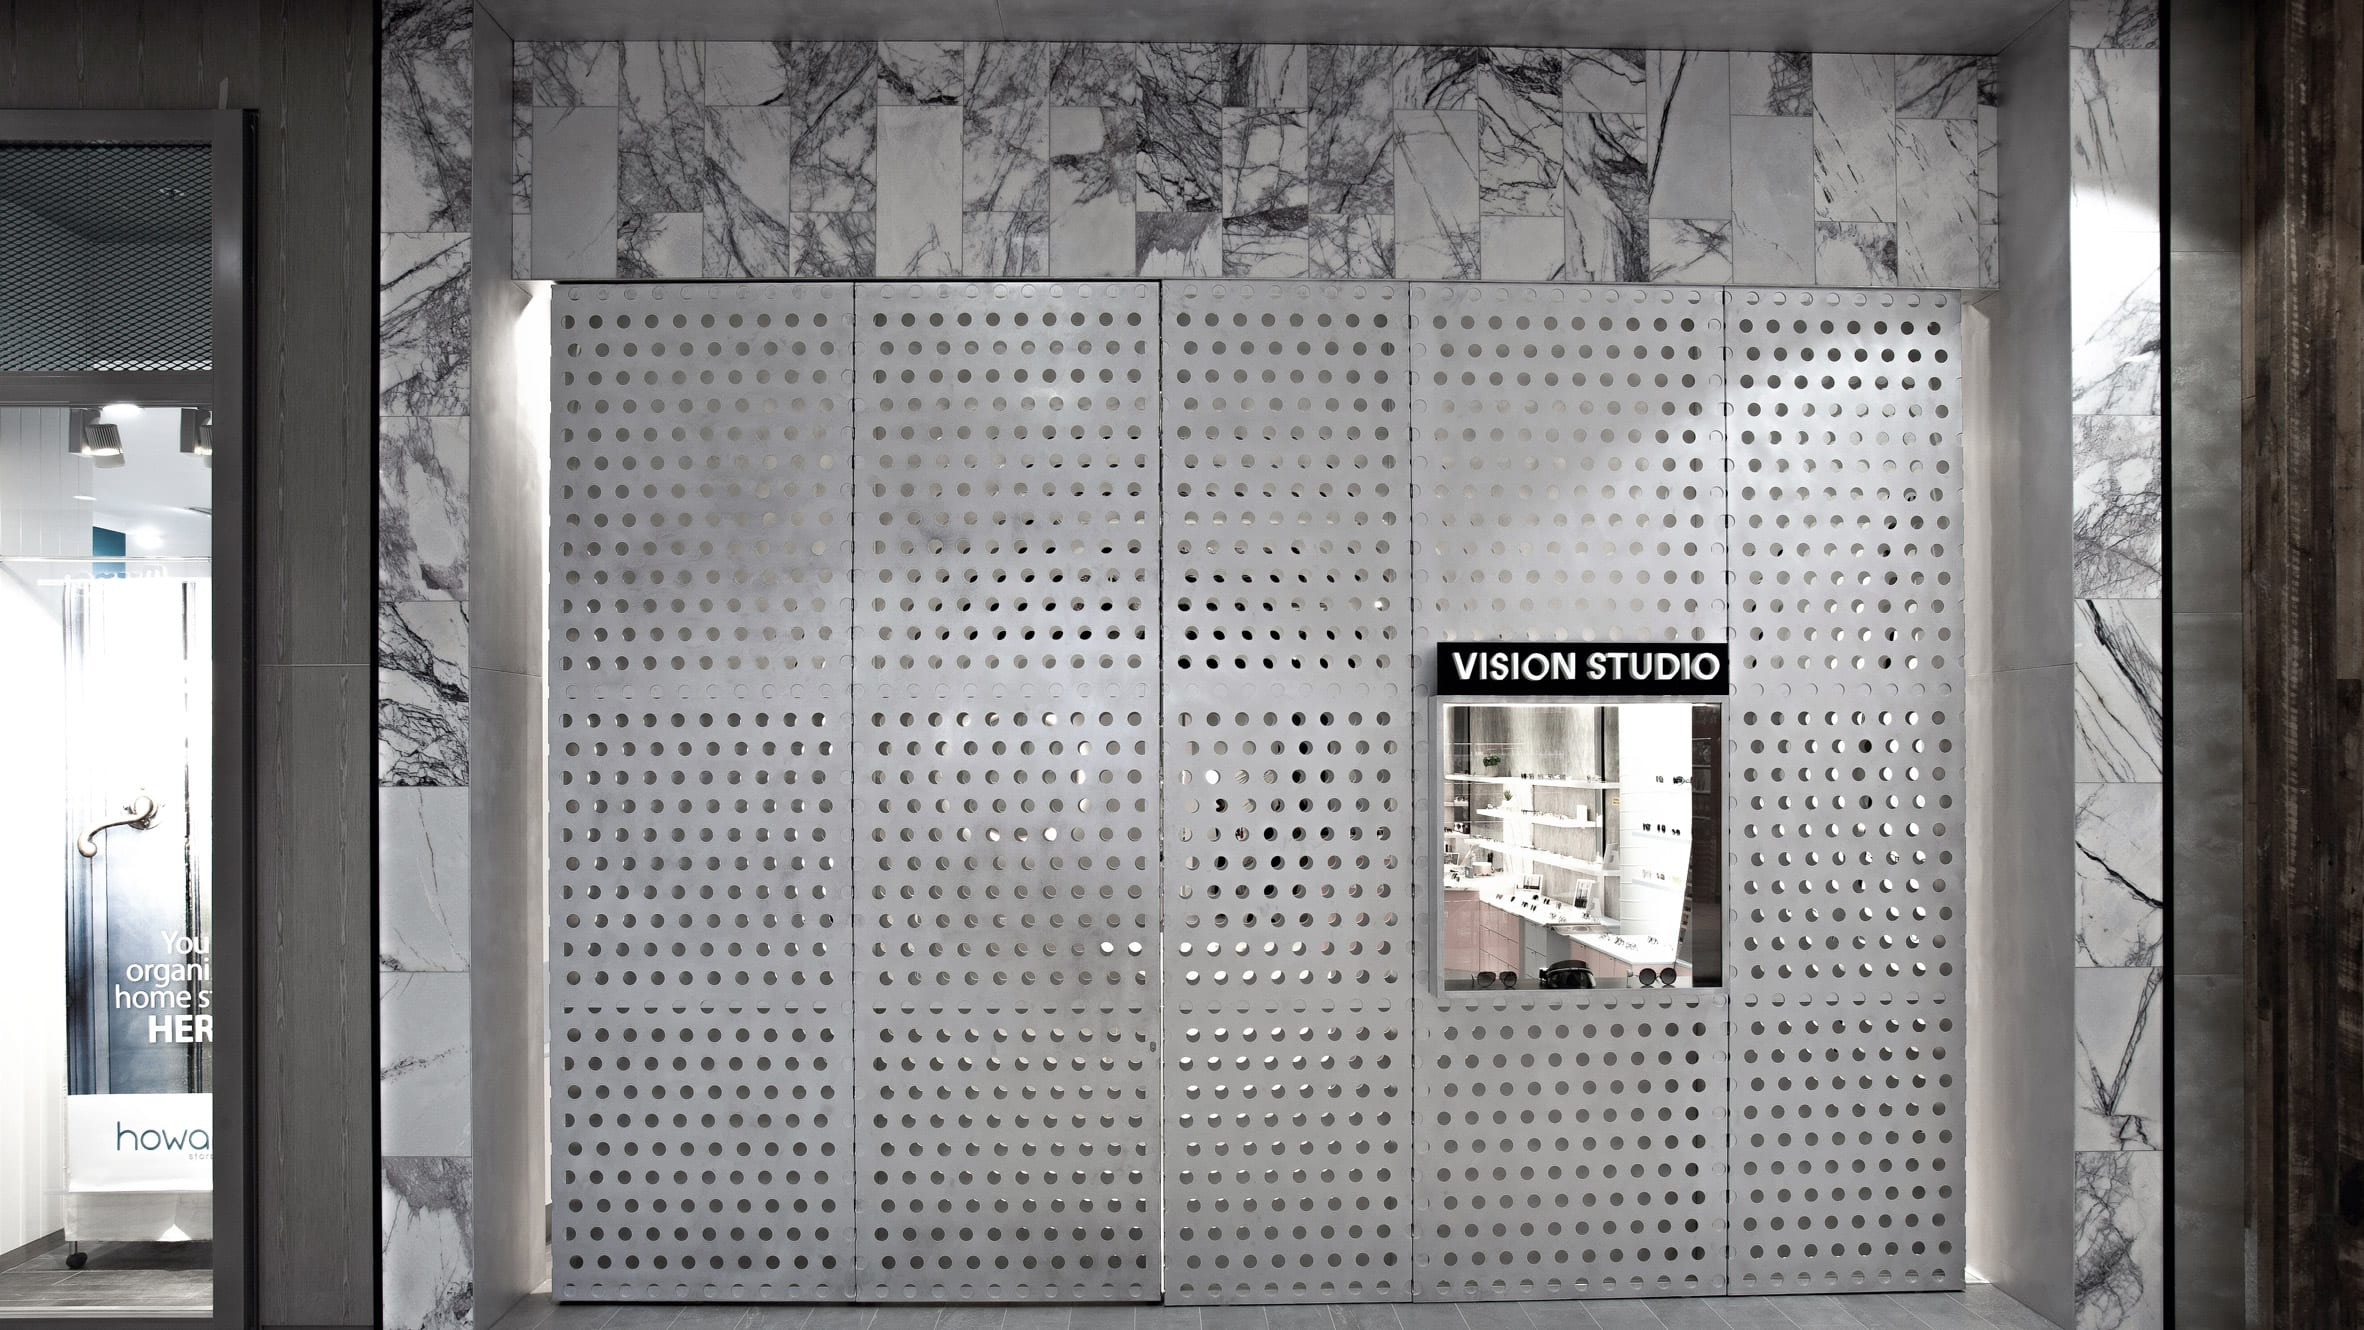 Perforated aluminium facade of retail interior by Studio Edwards